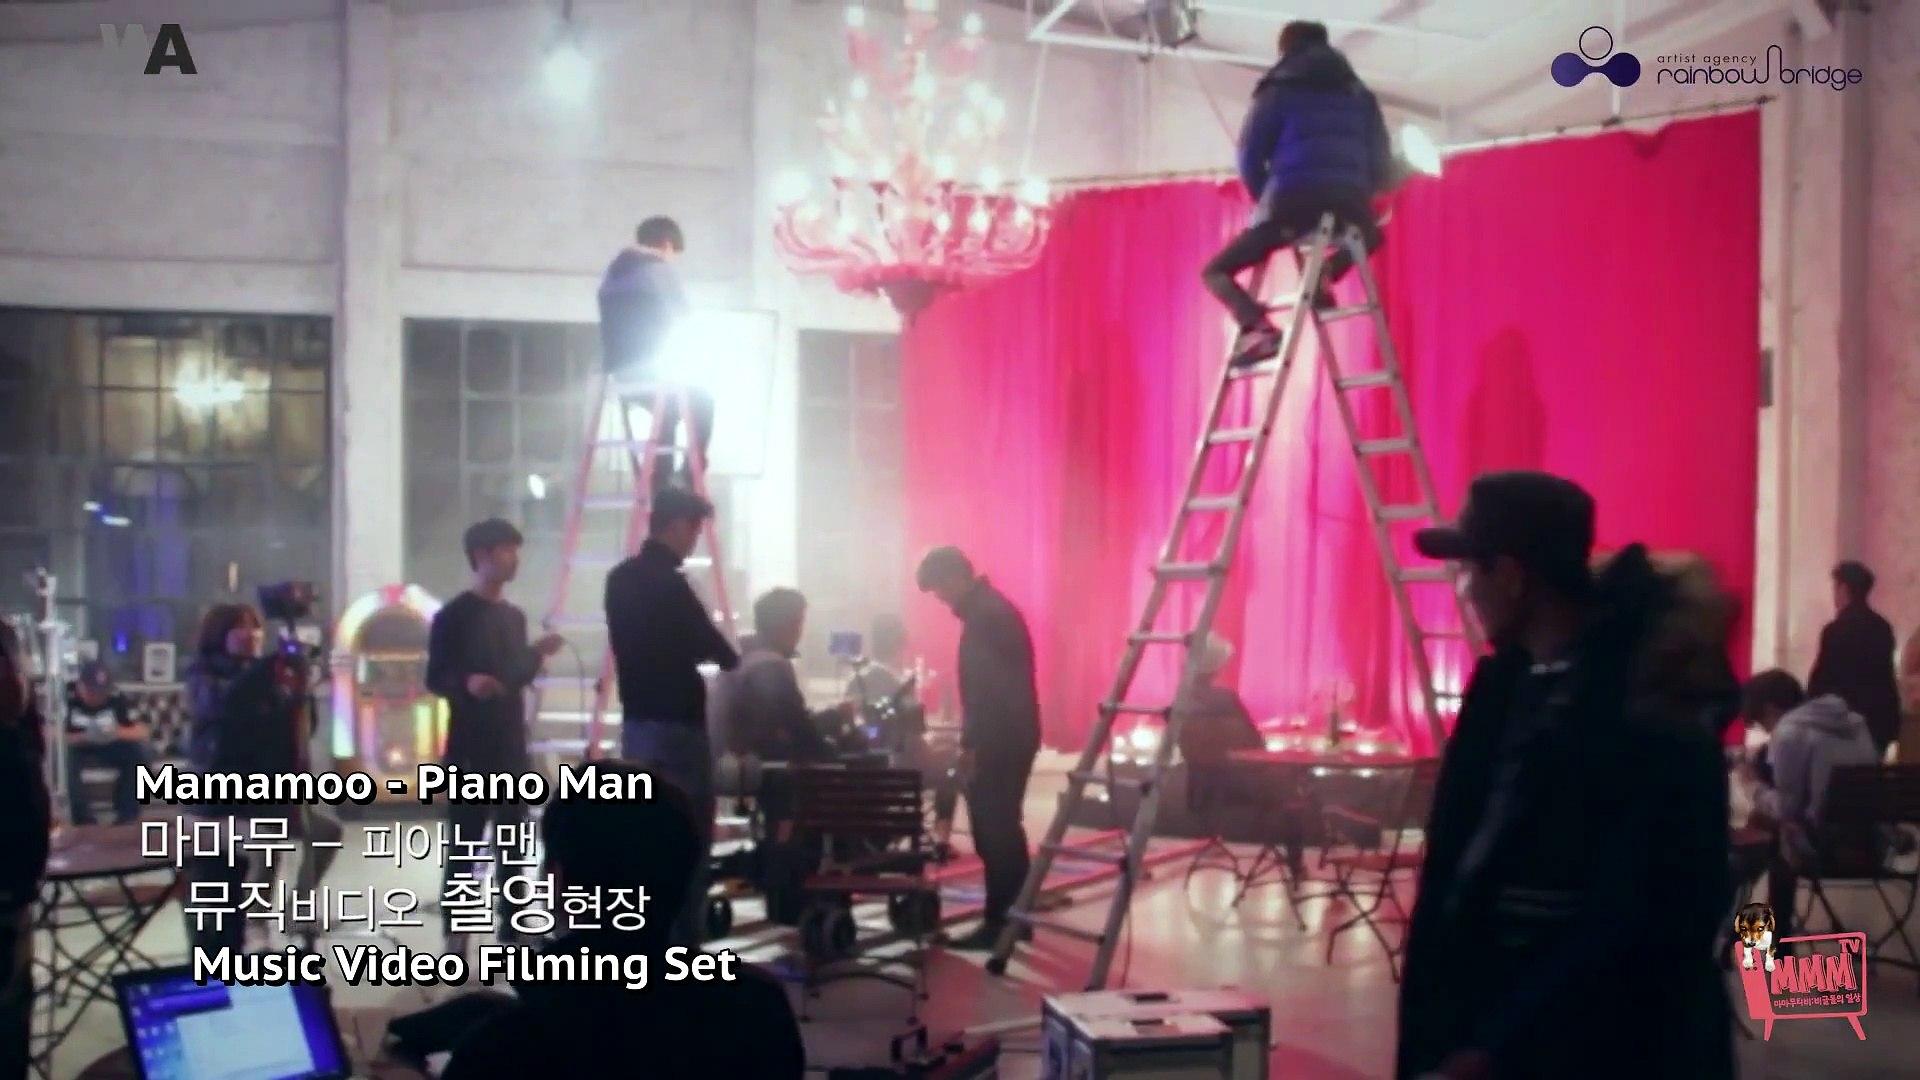 [ENG SUB] MMMTV Episode 1 - 'Piano Man' MV Filming (Behind Story)